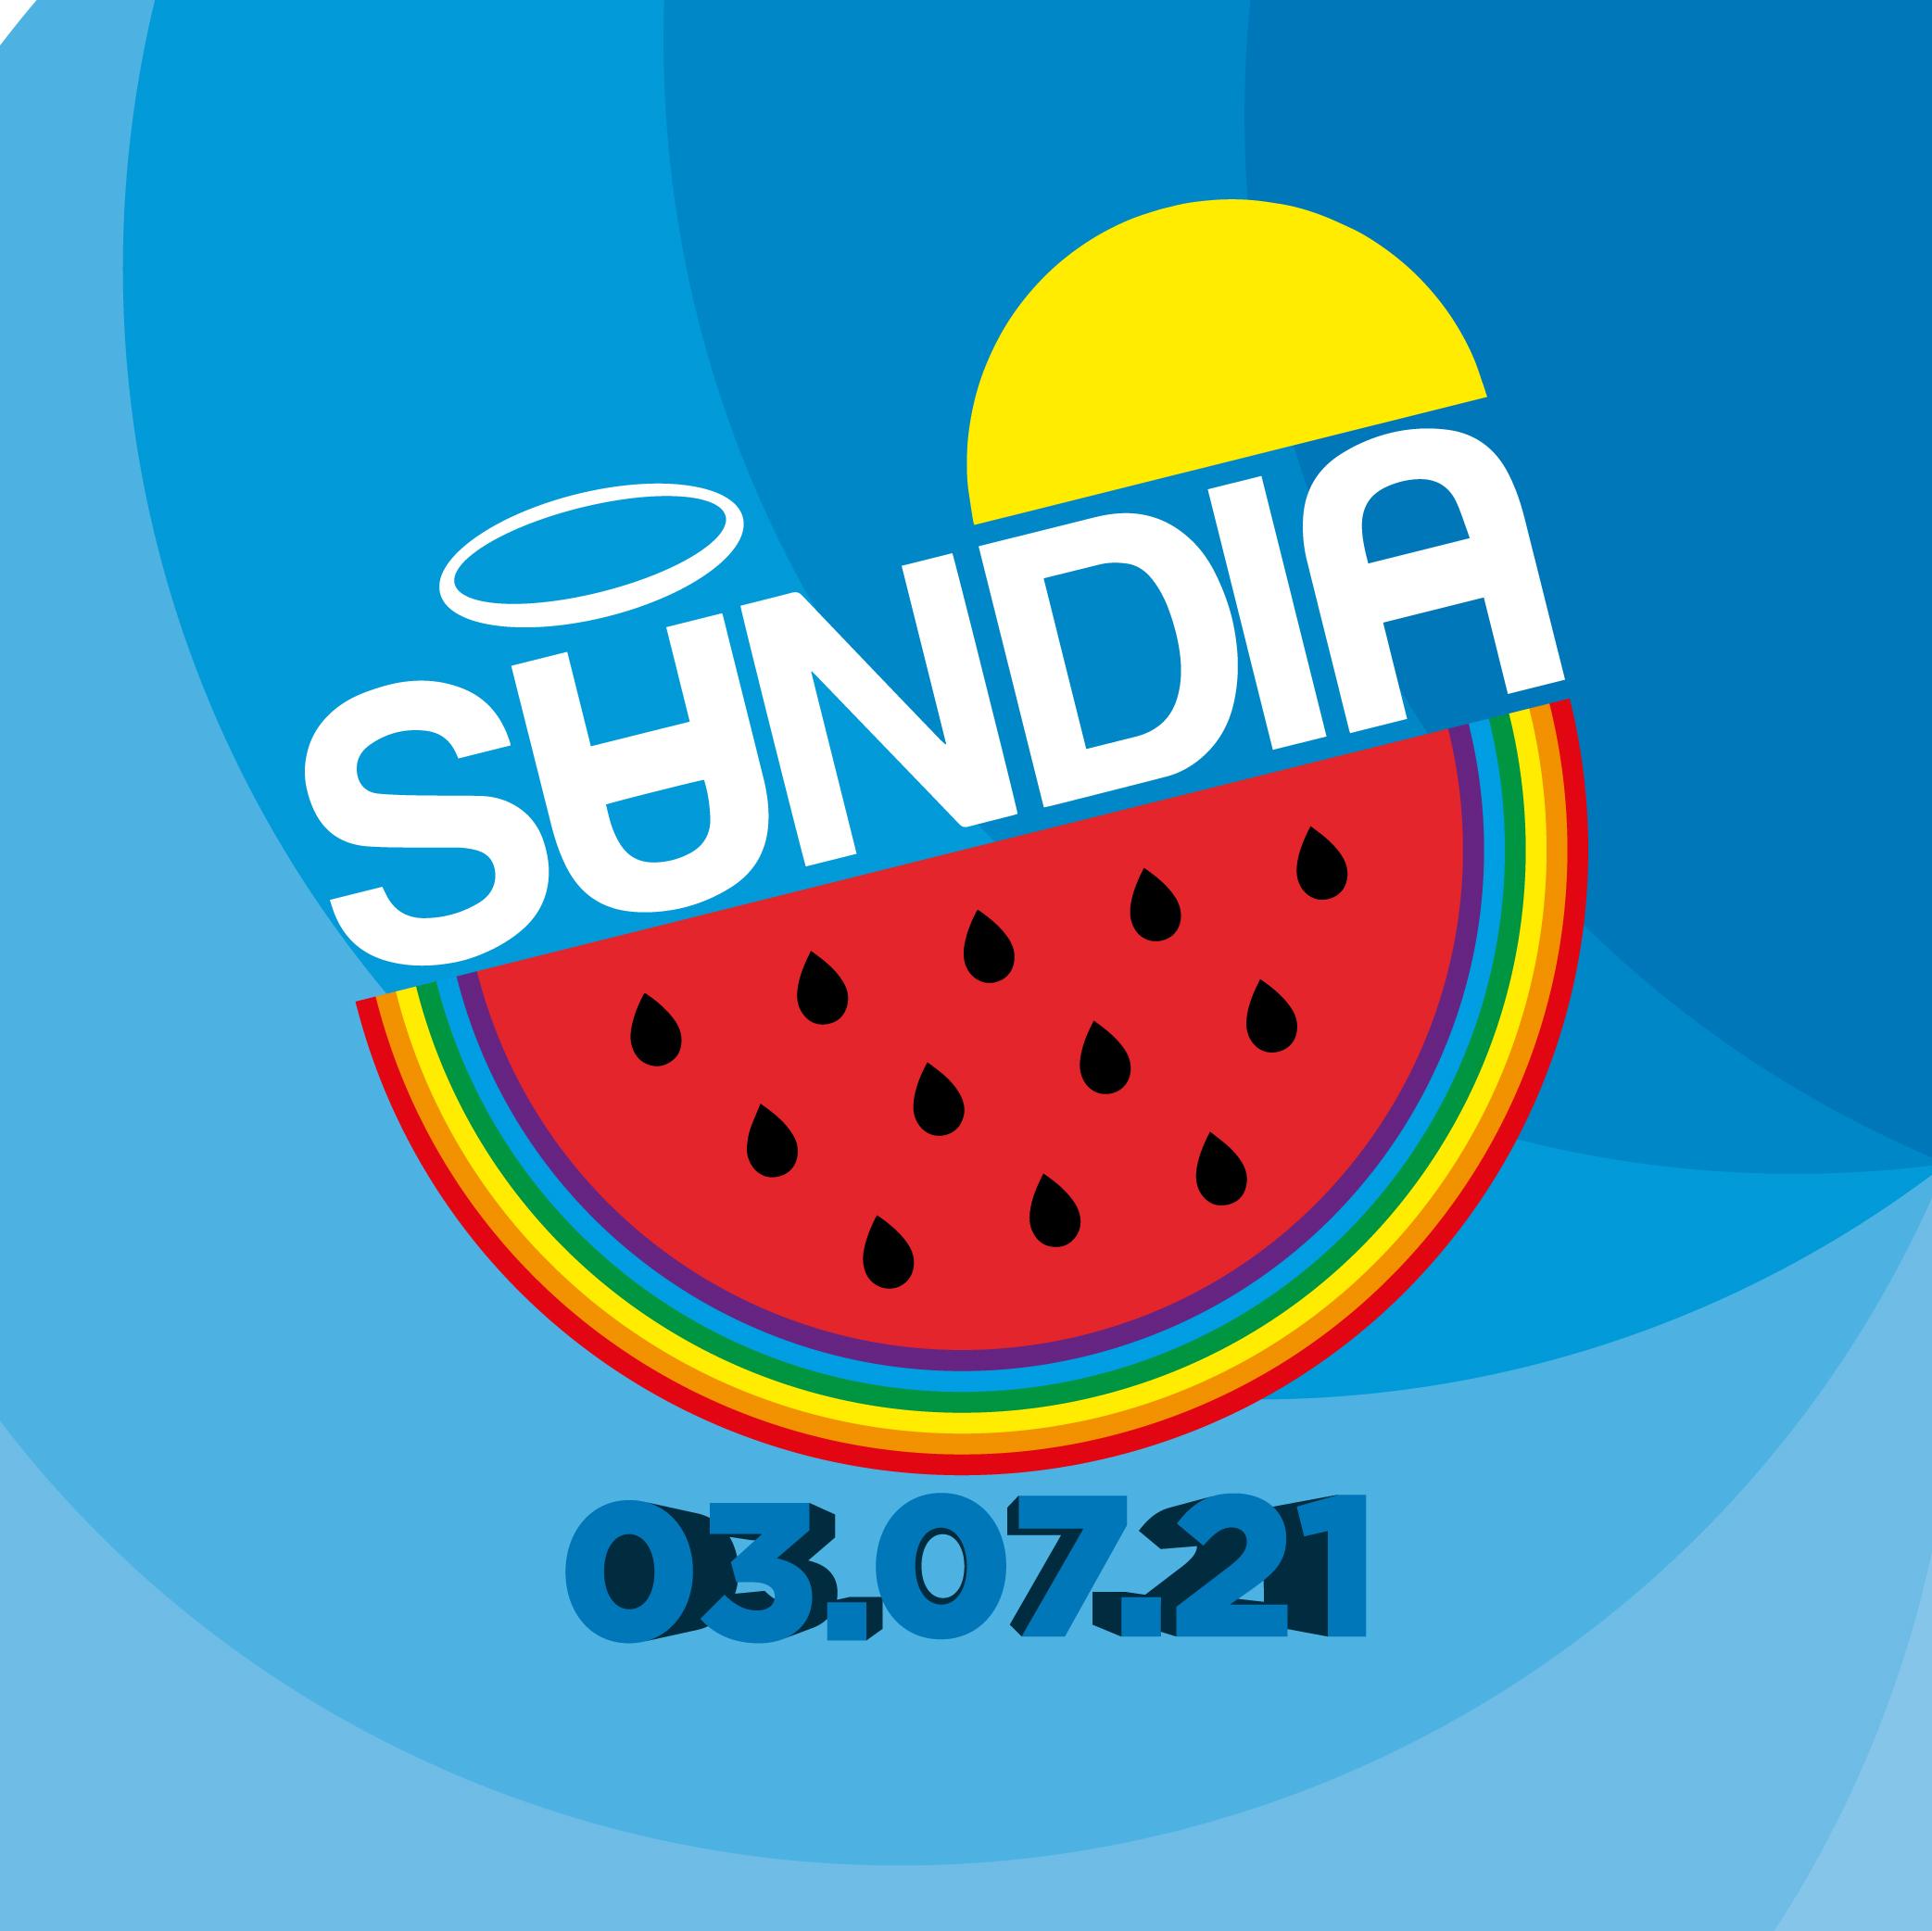 03-07-21-sundia-party-day-party-60ccd0c606e77.jpeg